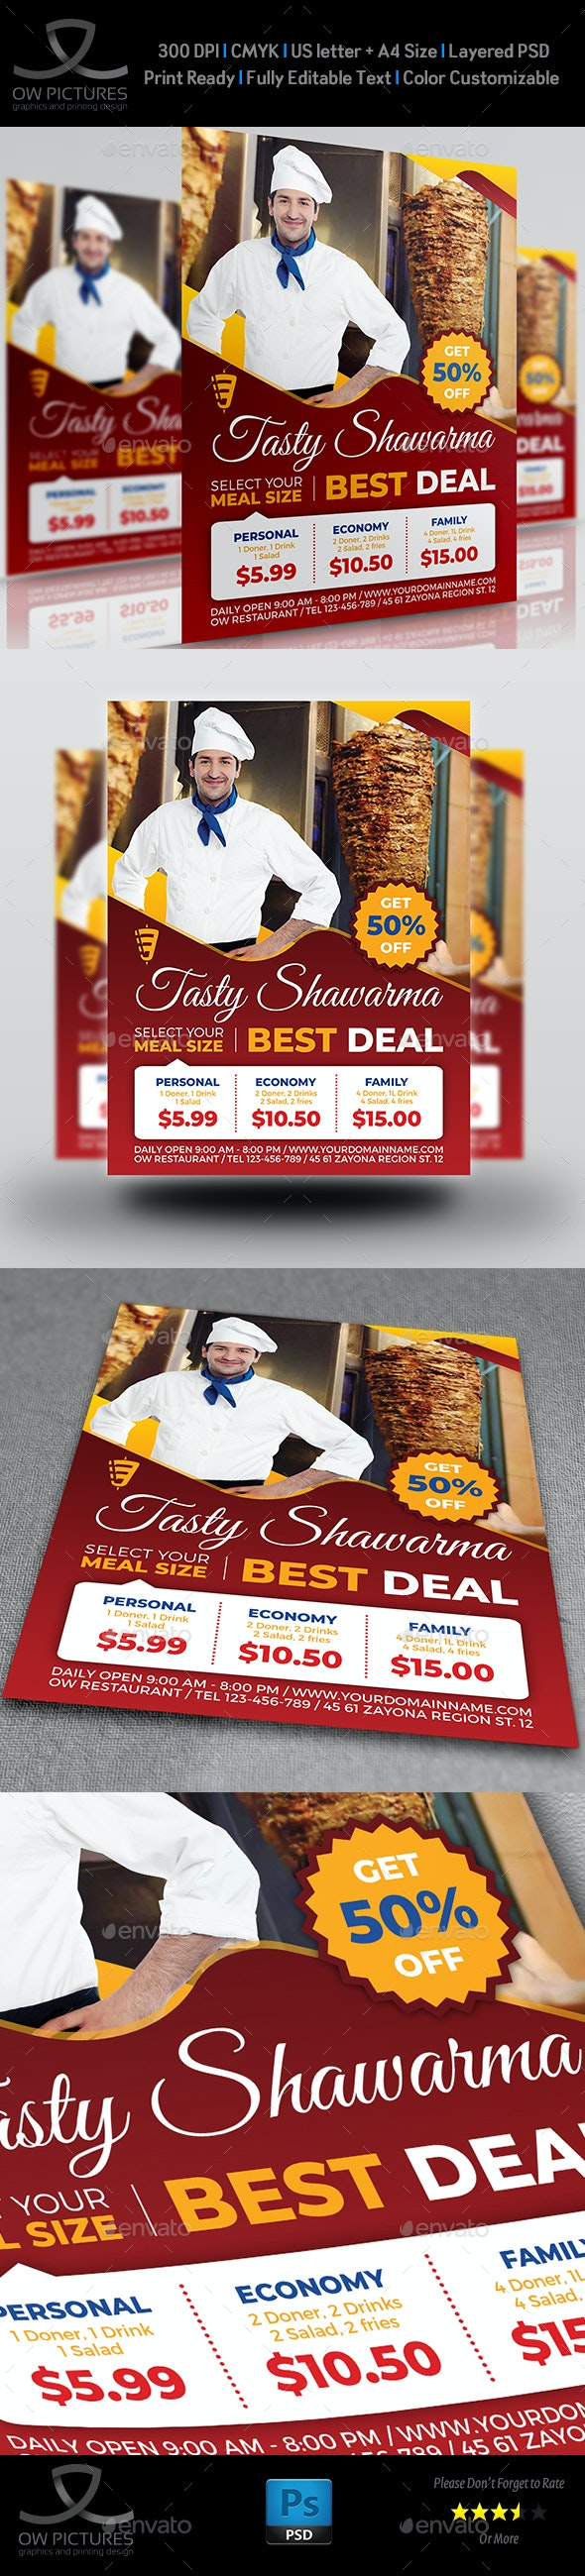 Shawarma Restaurant Flyer Template - Restaurant Flyers